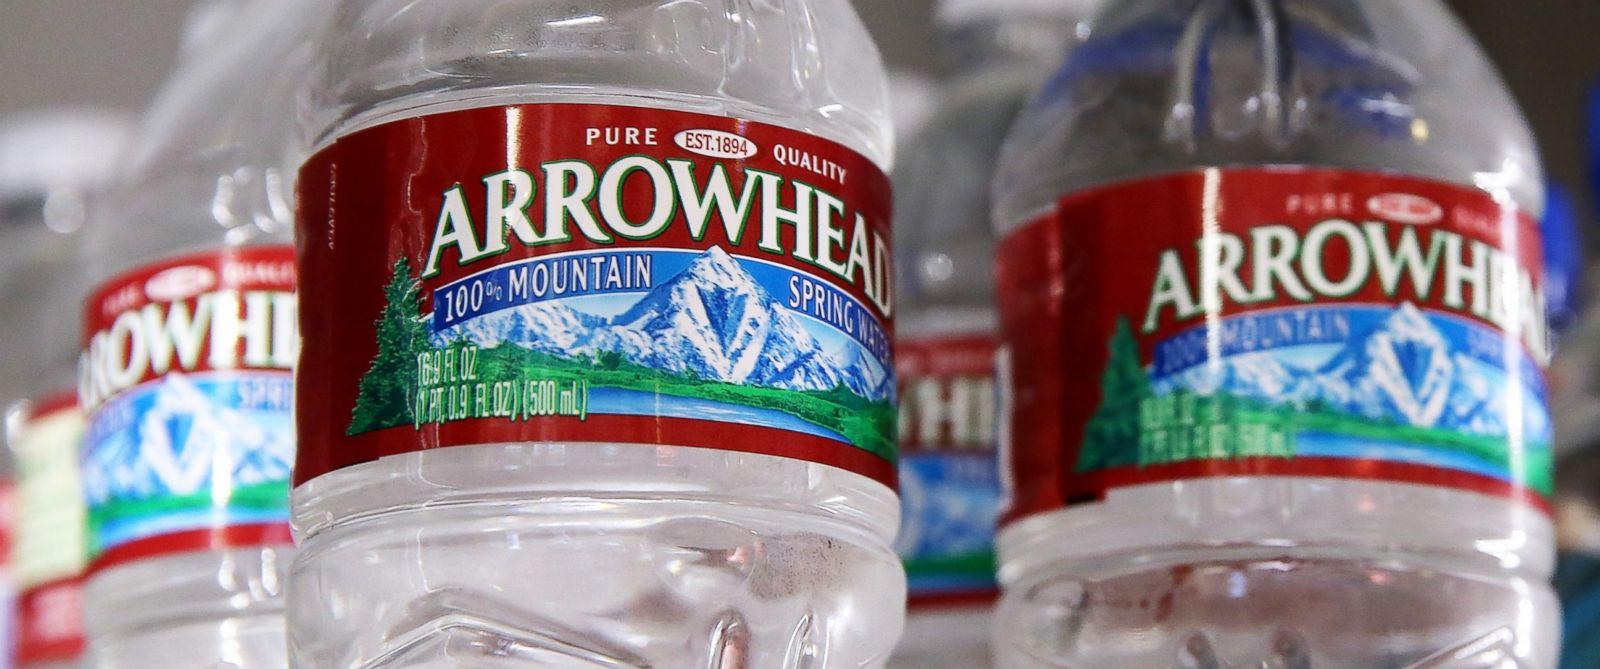 PHOTO: Bottles of Arrowhead water are displayed on Aug. 20, 2014 in San Rafael, Calif.